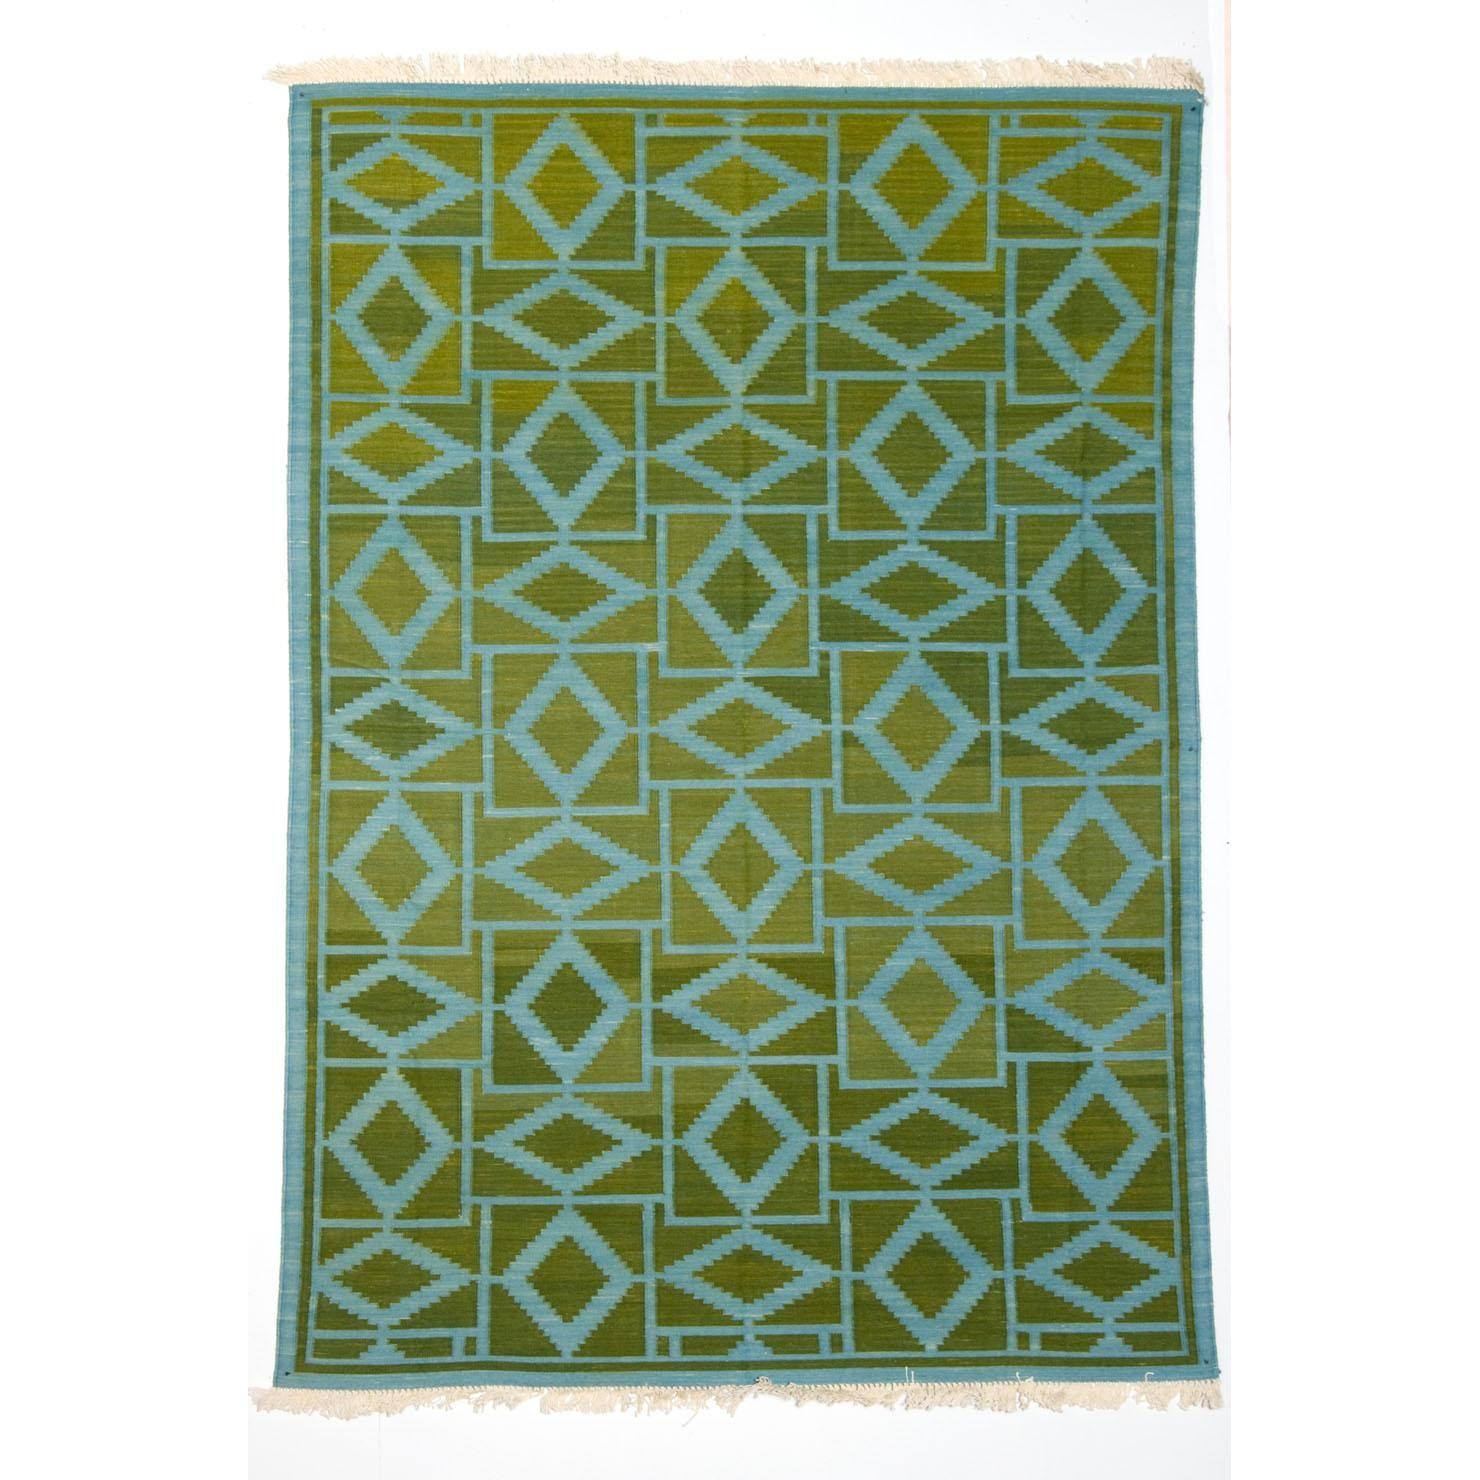 mahout lifestyle jaipur teppich mit rautenmuster 122x183cm gr n und blau achica shopping. Black Bedroom Furniture Sets. Home Design Ideas